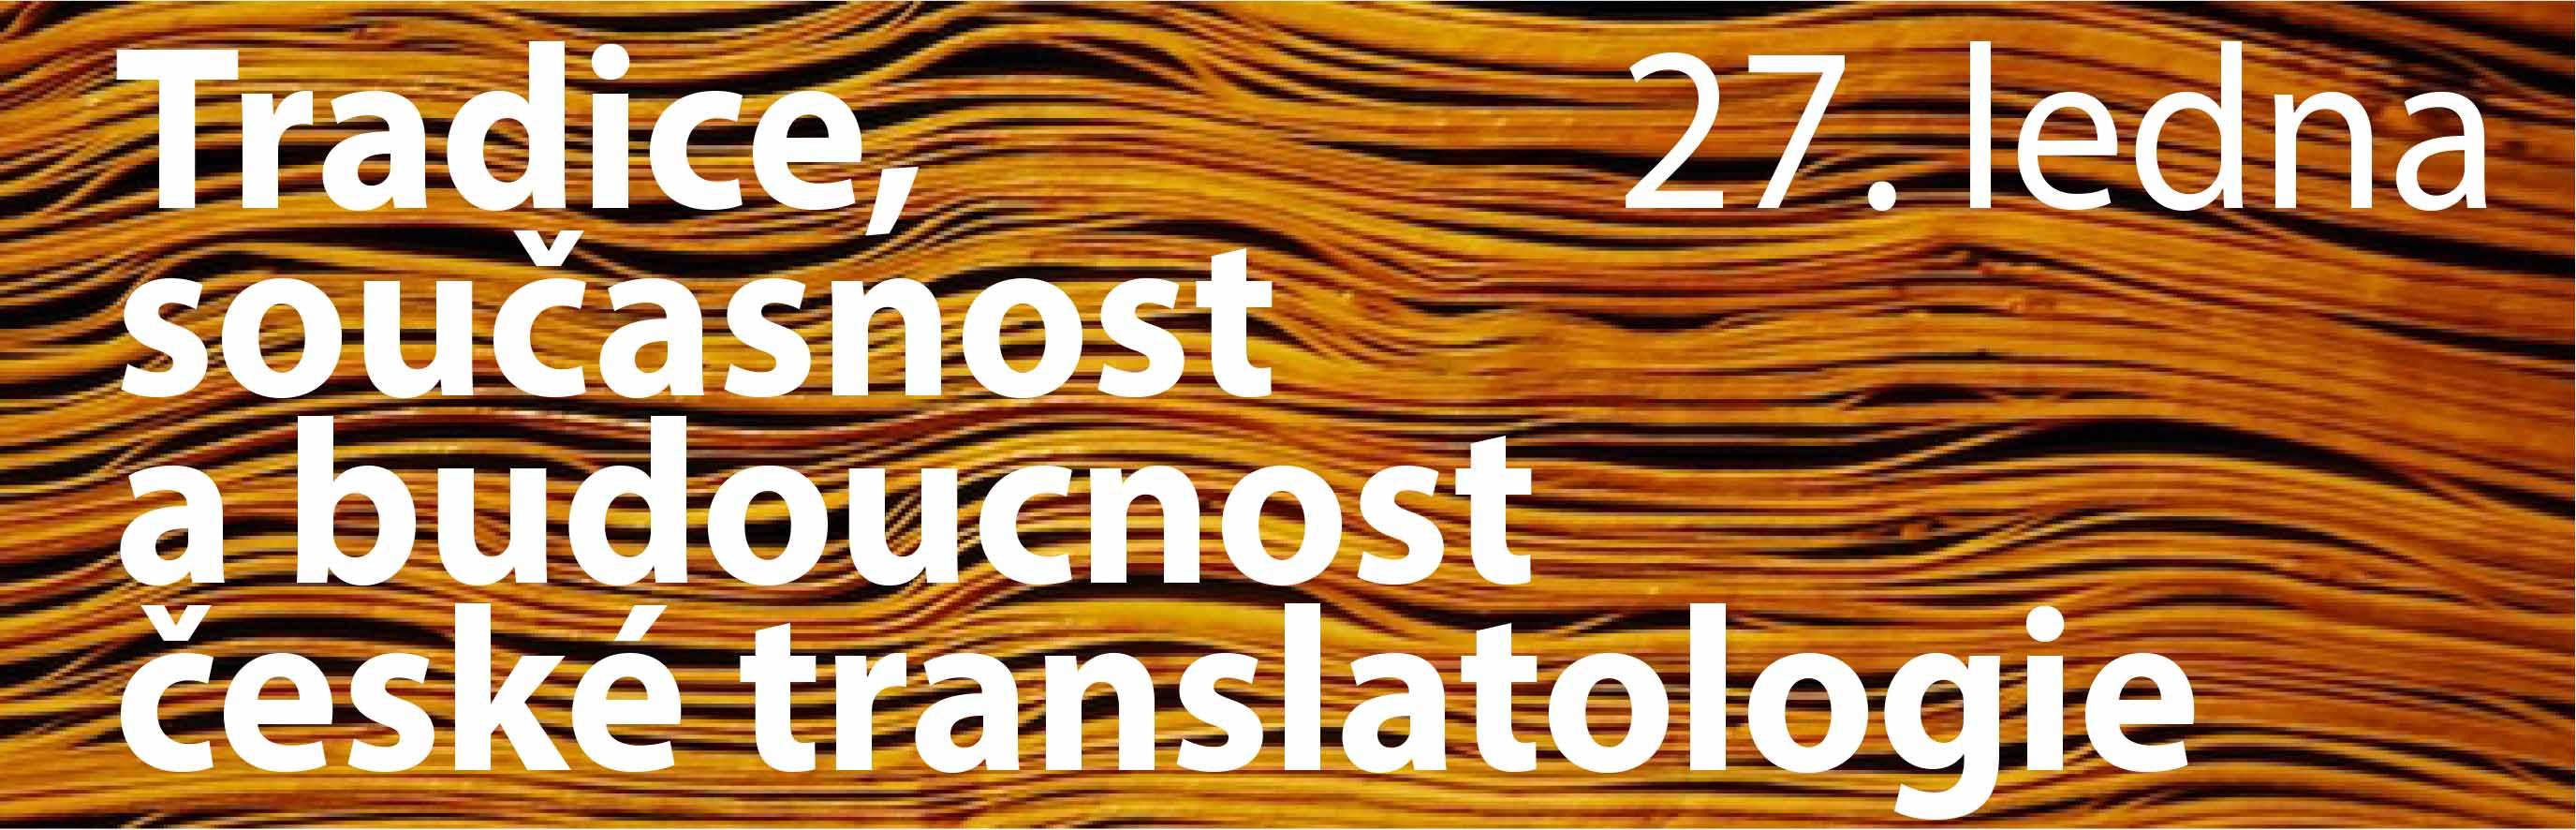 Tradice, soucasnost a budoucnost ceske translatologie